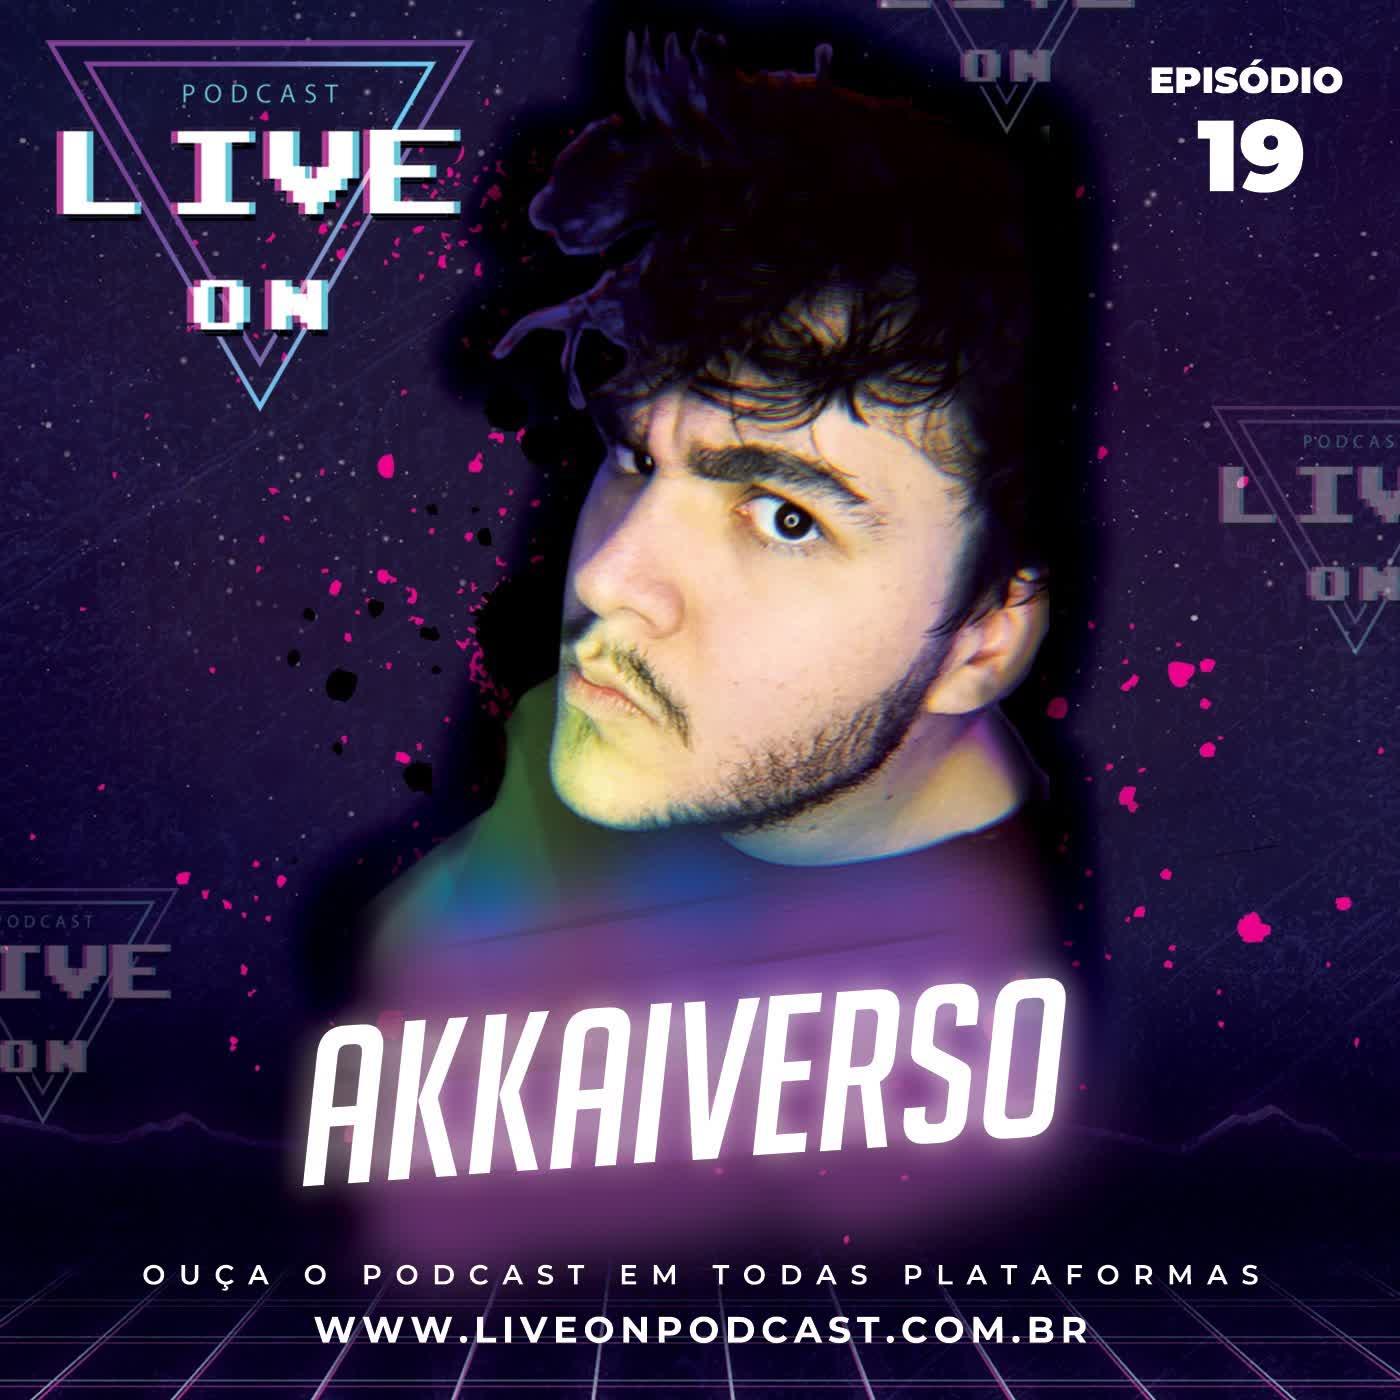 Live On Podcast - Convidado: Akkaiverso - Episódio 19